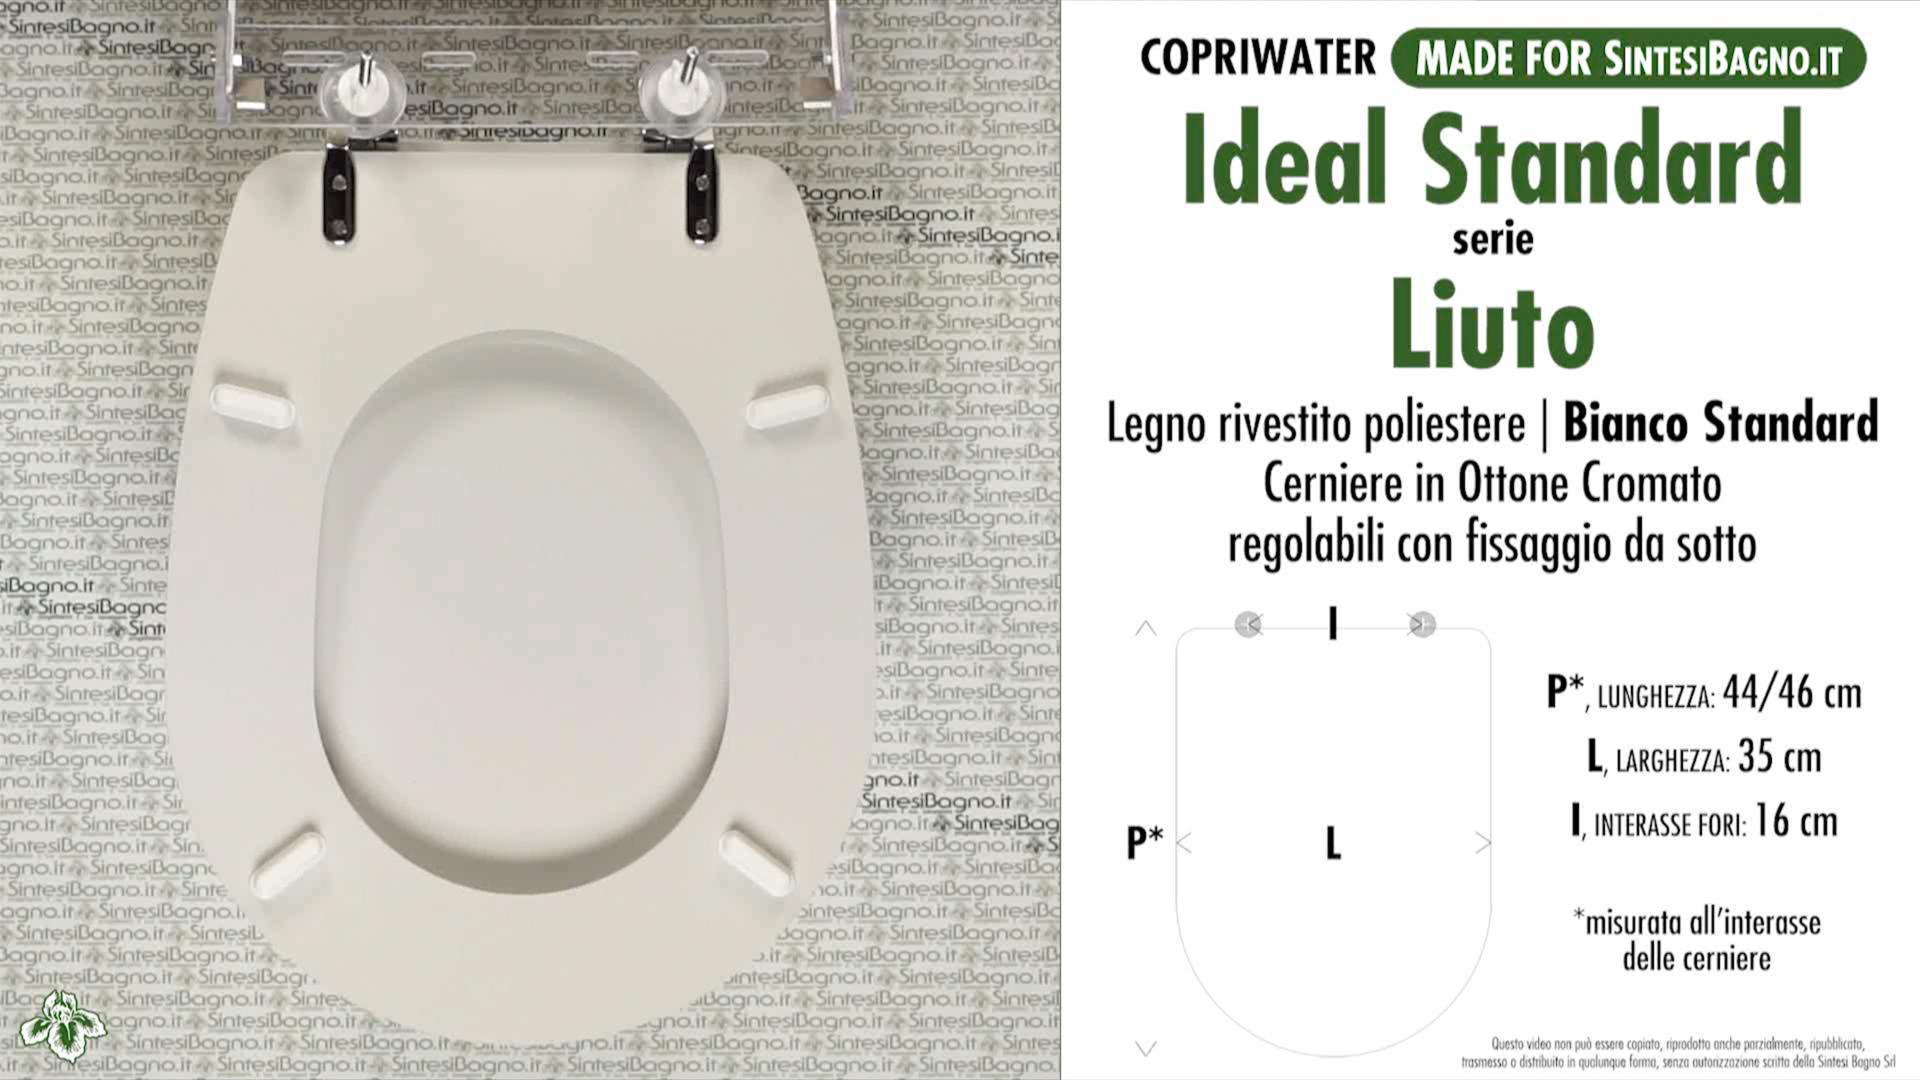 Copriwater dedicato per vaso ideal standard serie liuto for Copriwater ideal standard